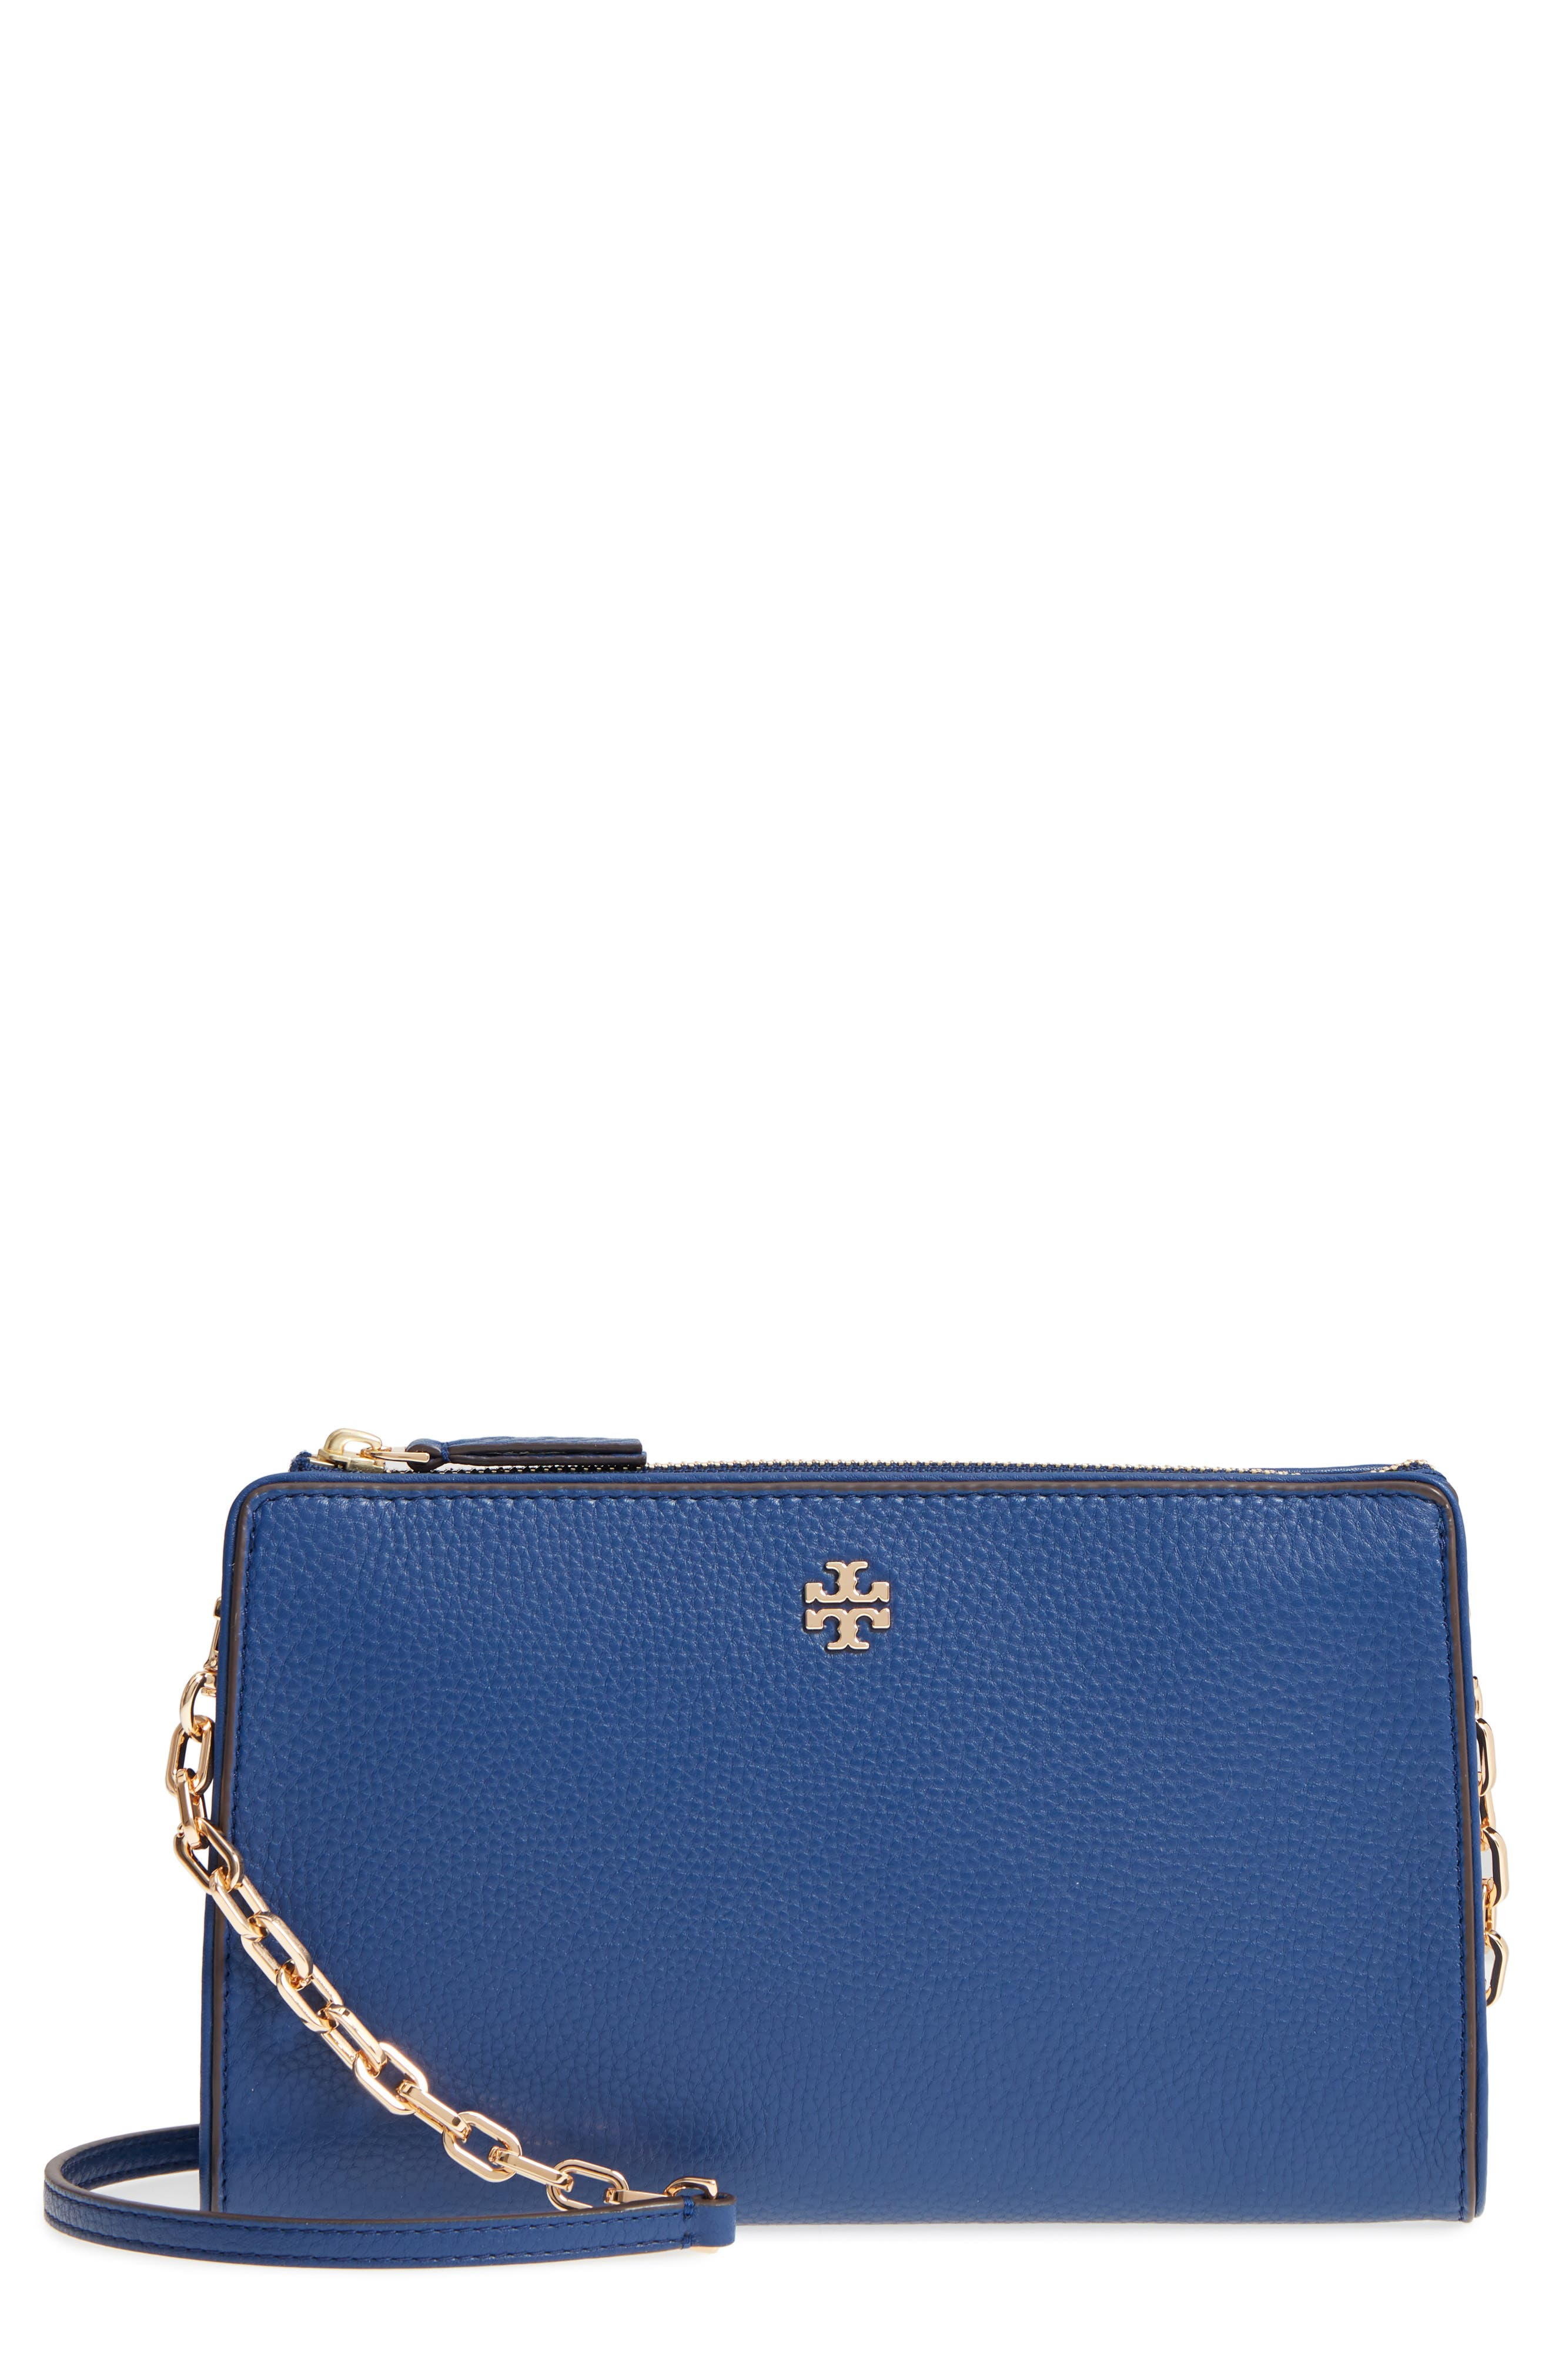 Marsden Leather Wallet Crossbody Bag,                             Main thumbnail 1, color,                             FRESH BLUEBERRY